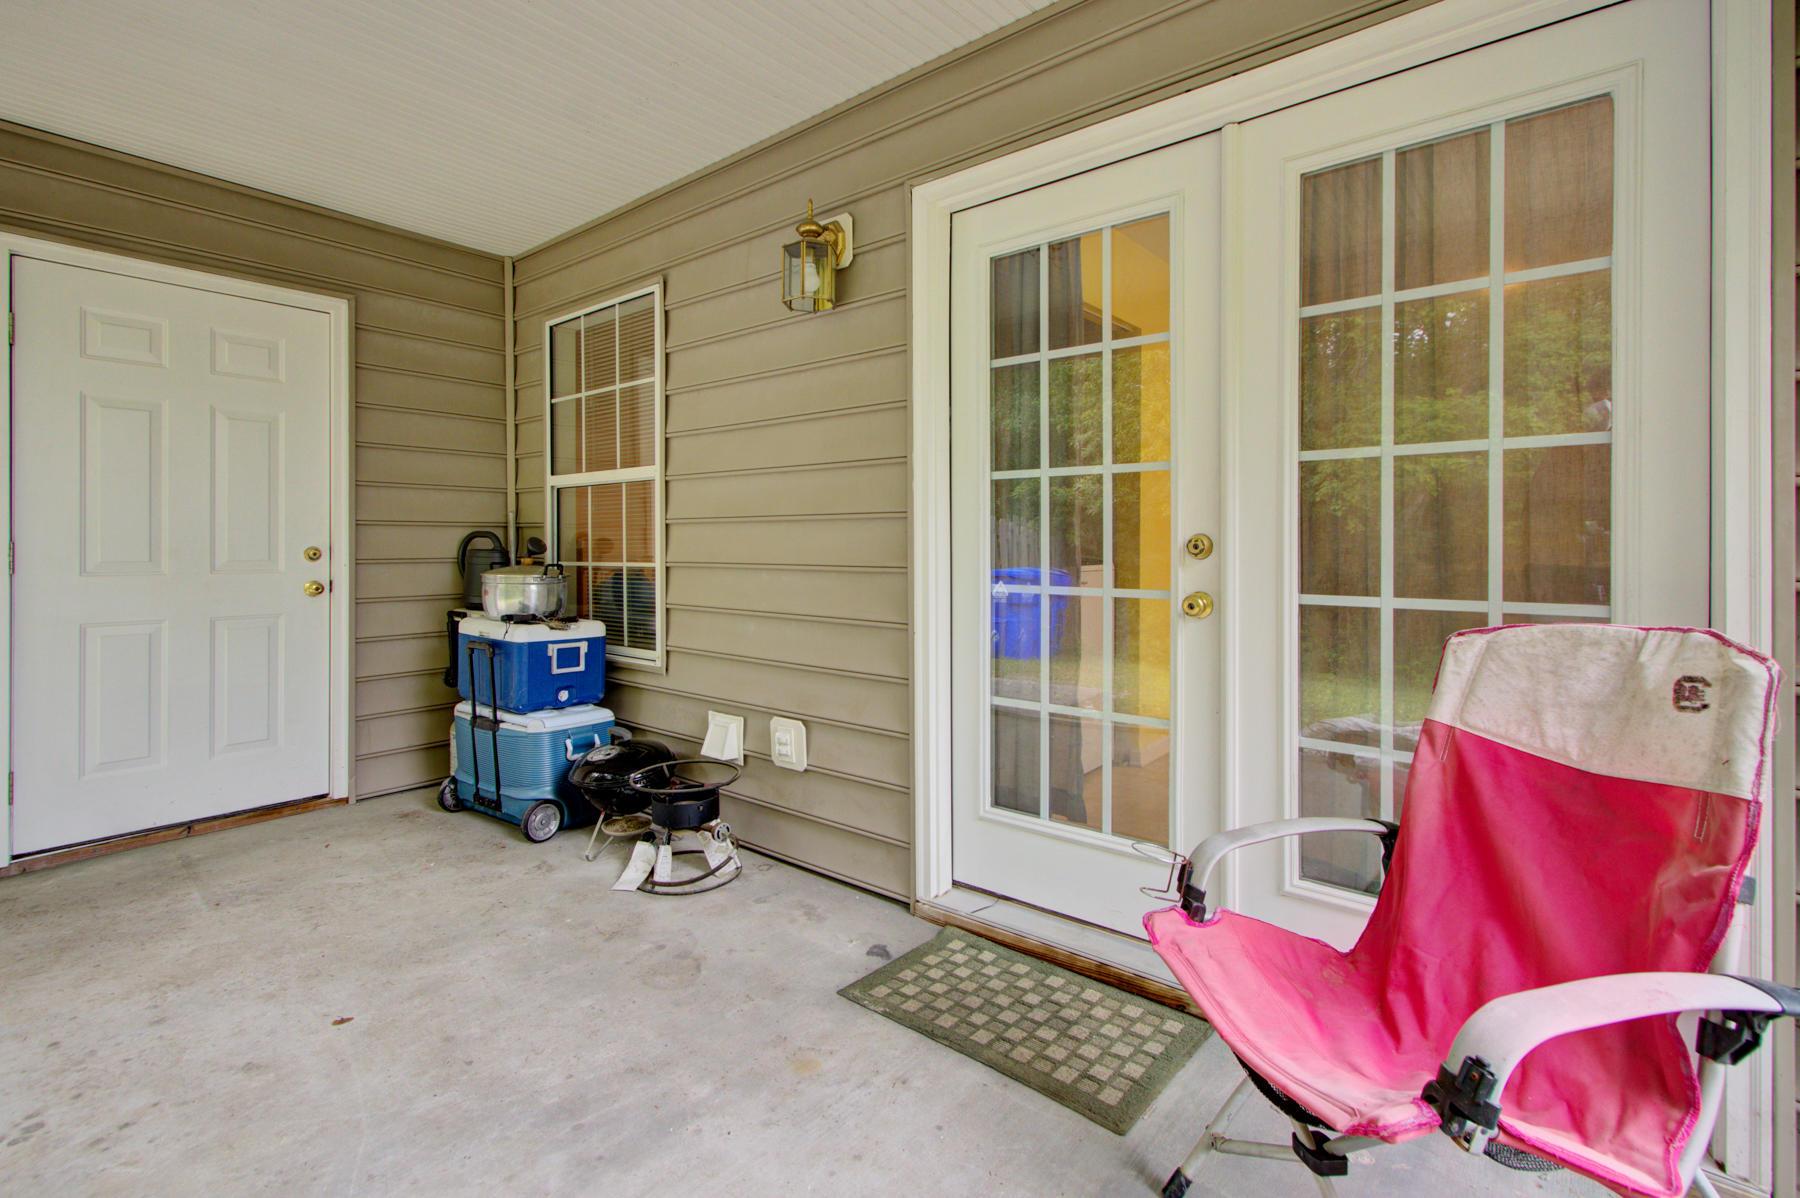 Dunes West Homes For Sale - 2232 Kings Gate, Mount Pleasant, SC - 8